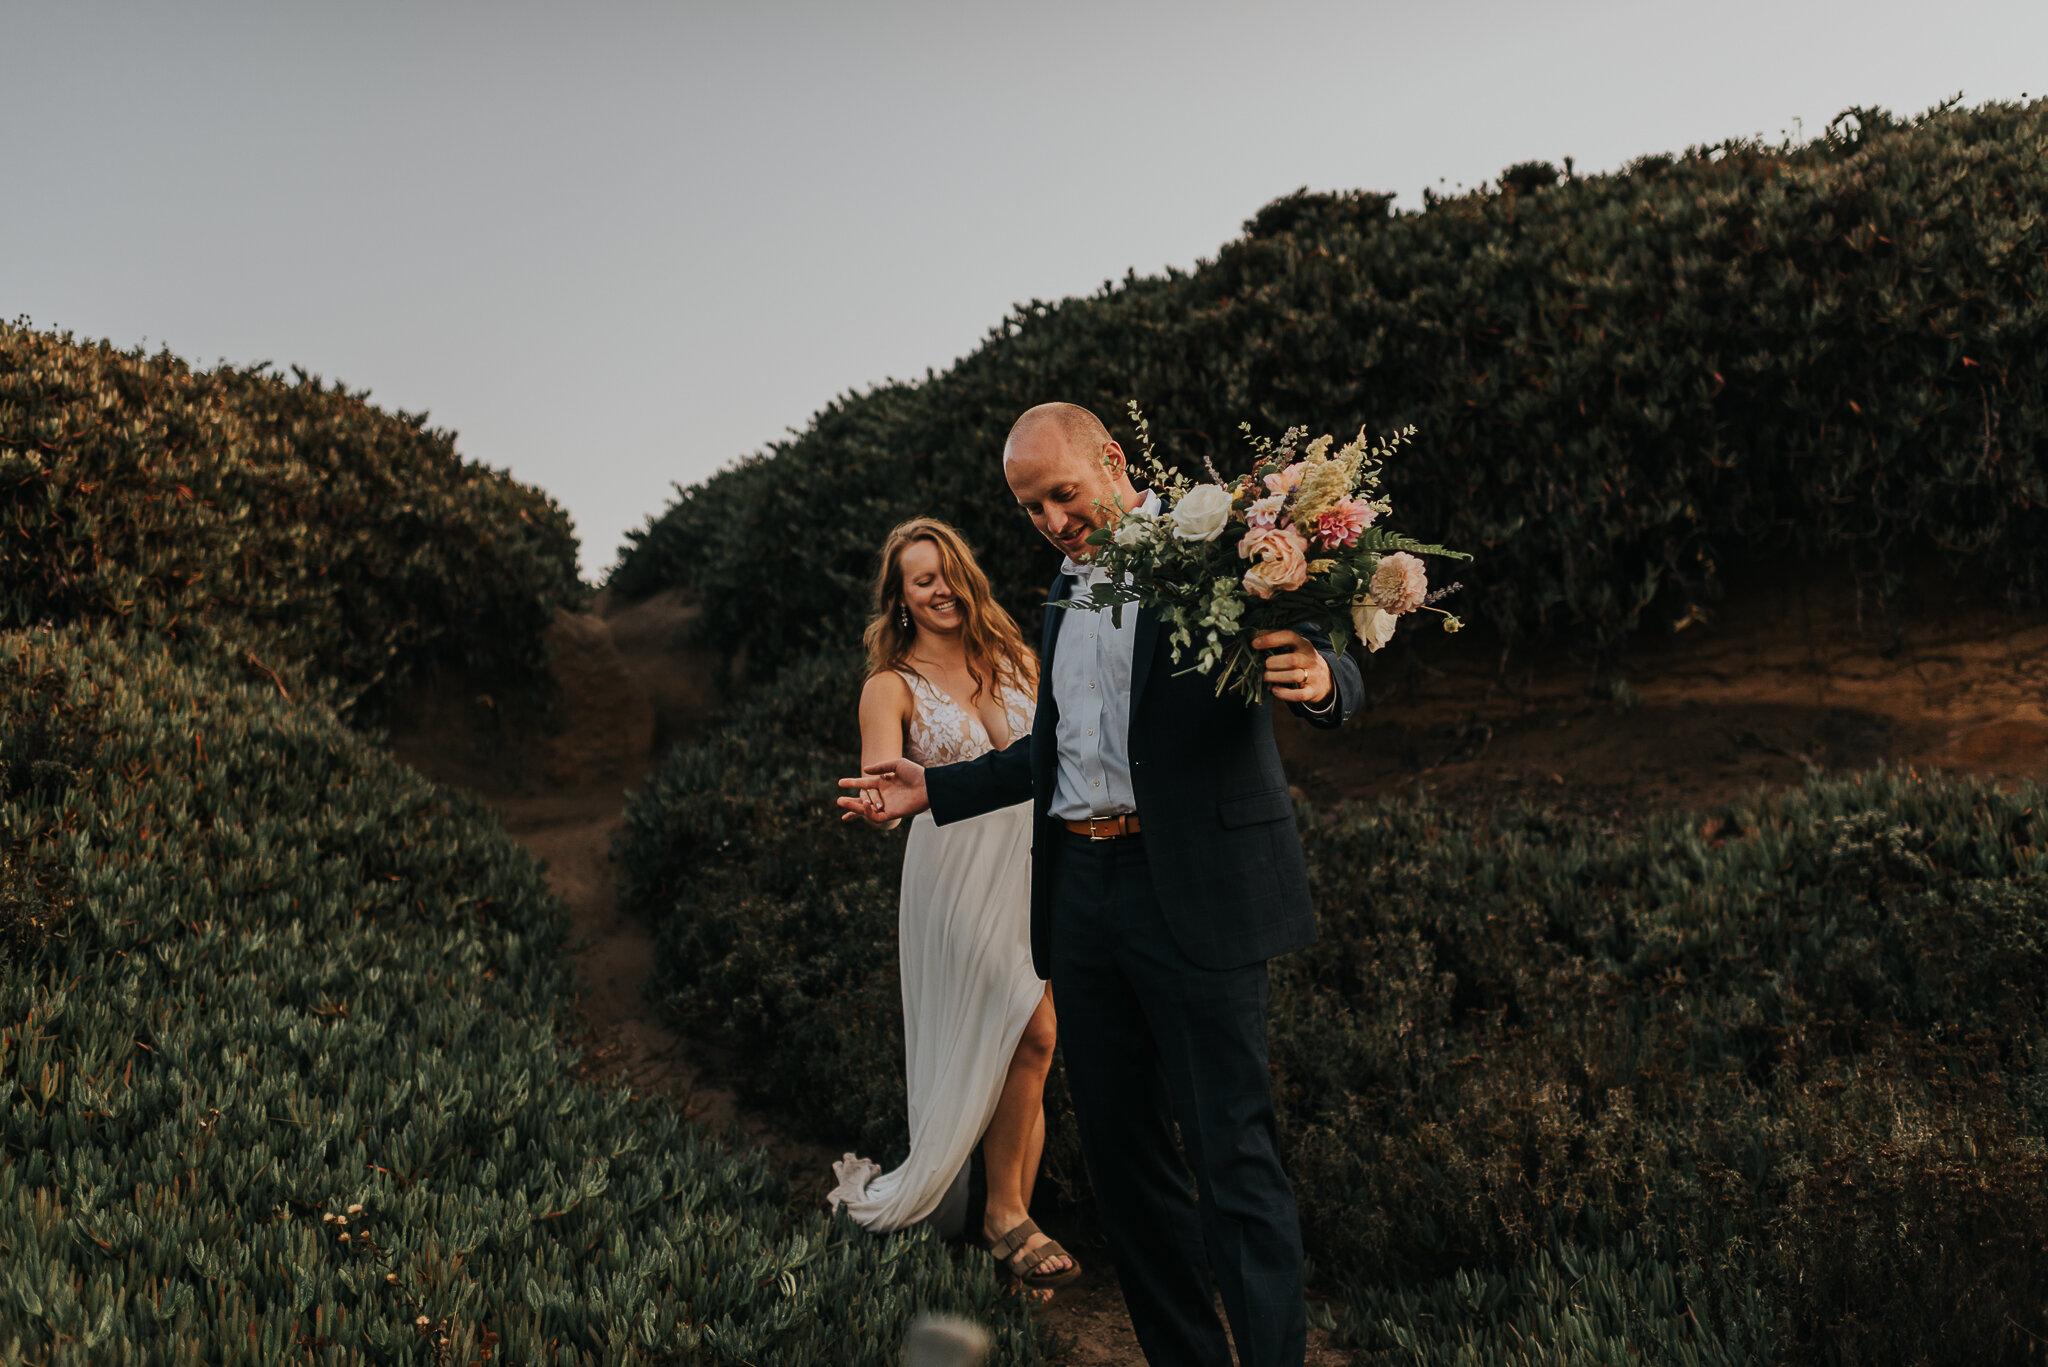 Ventana wedding photographer